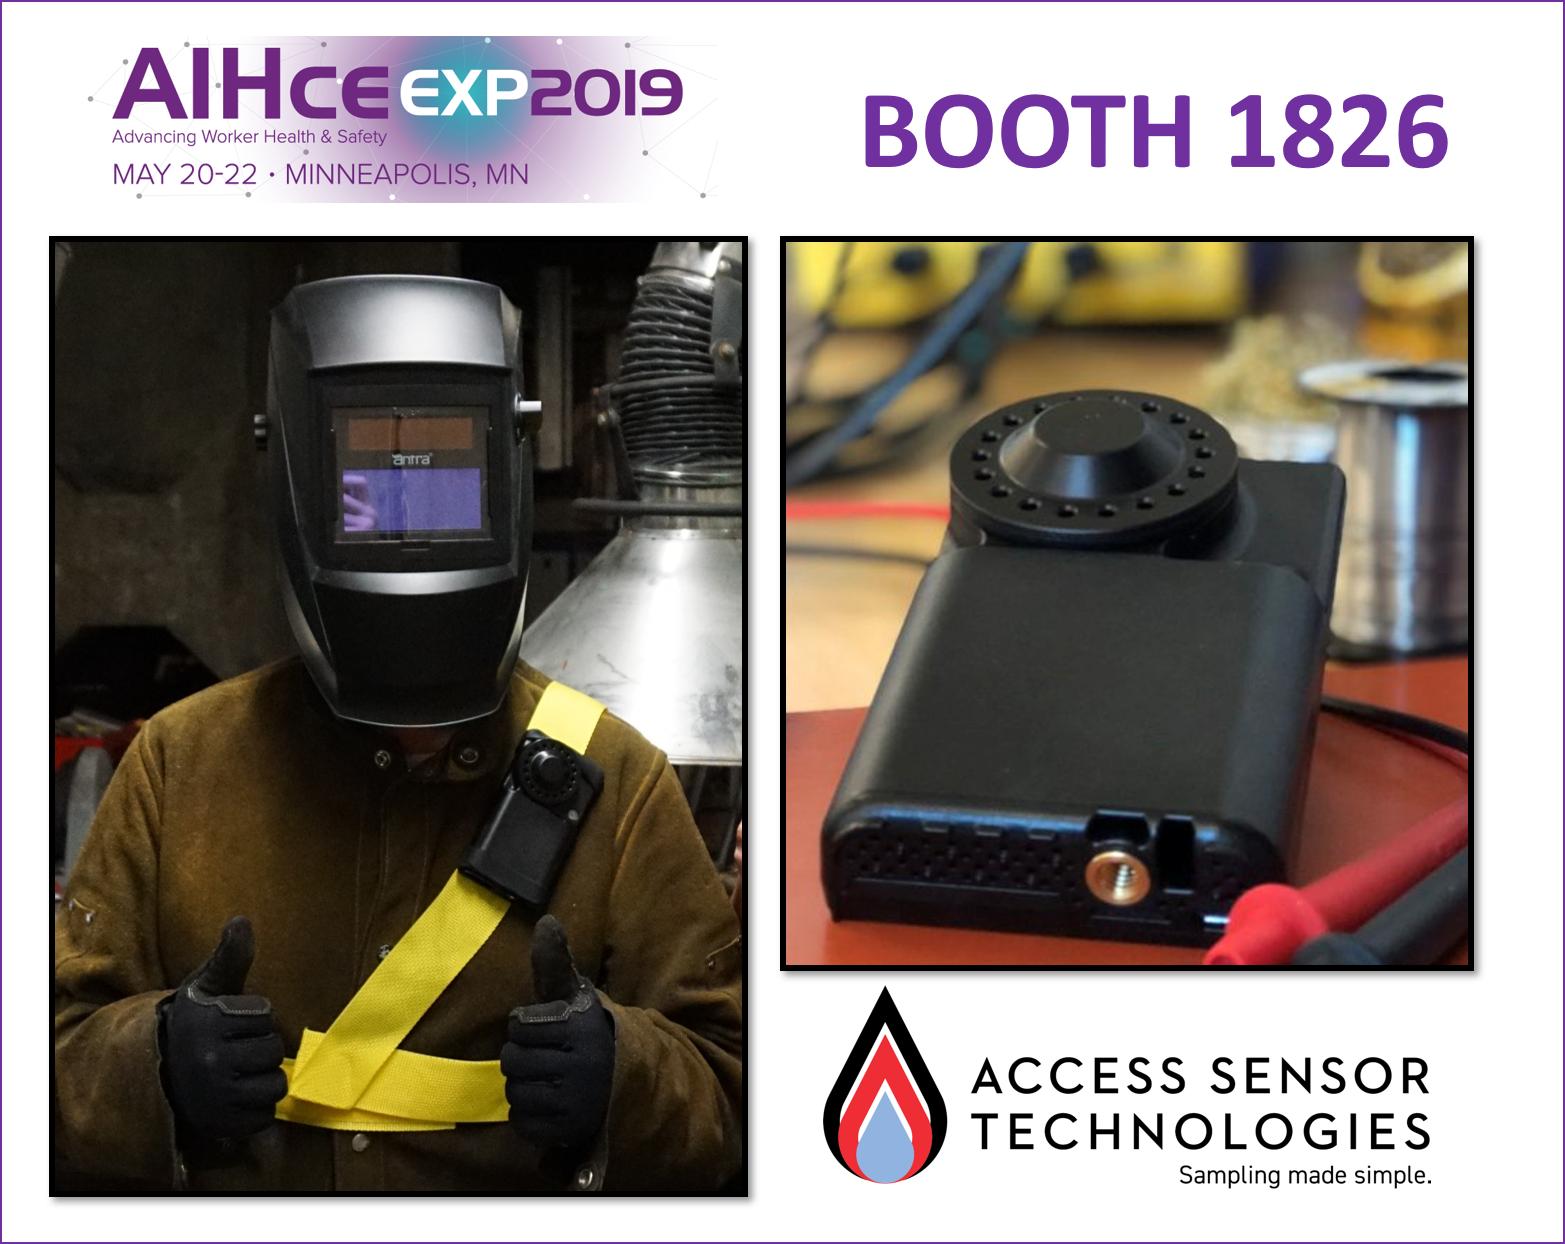 AIHce 2019 Access Sensor Technologies.png